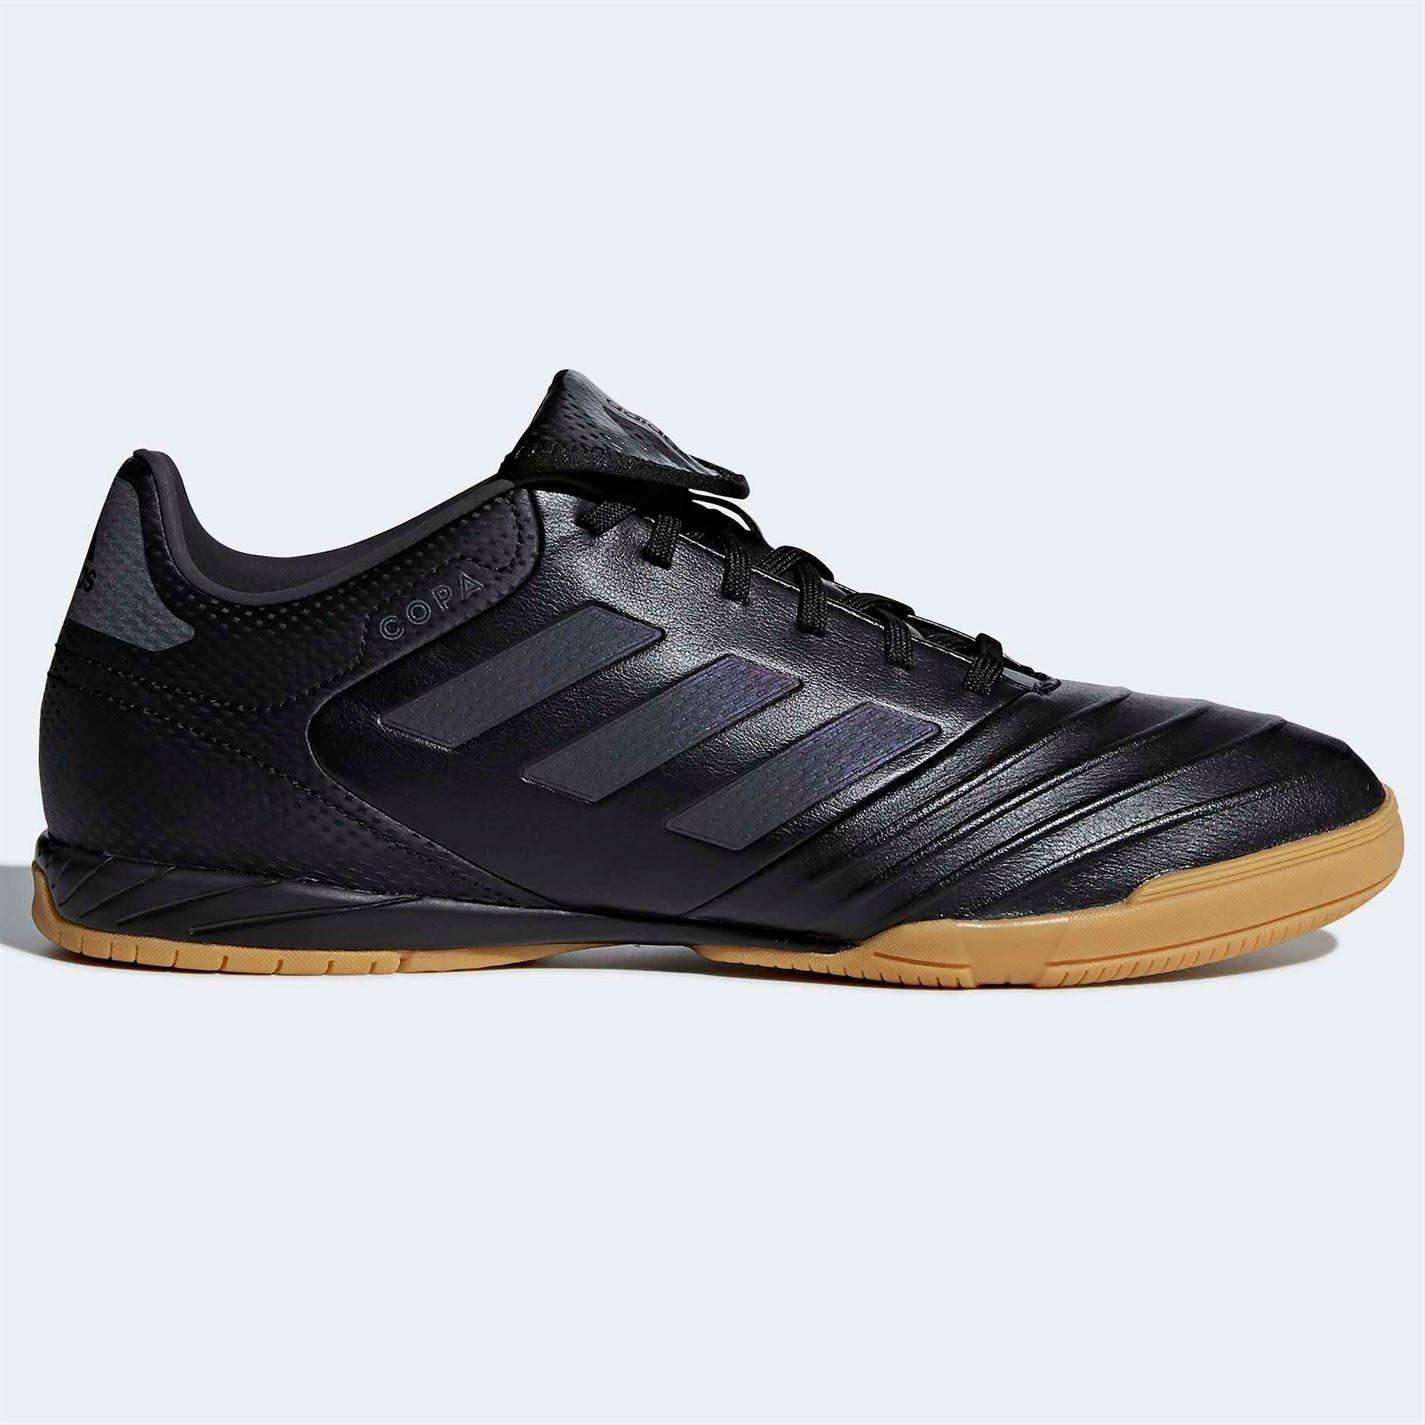 7e6580ae9113 ... adidas Copa Tango 18.3 Indoor Football Trainers Mens Black Soccer  Futsal Shoes ...